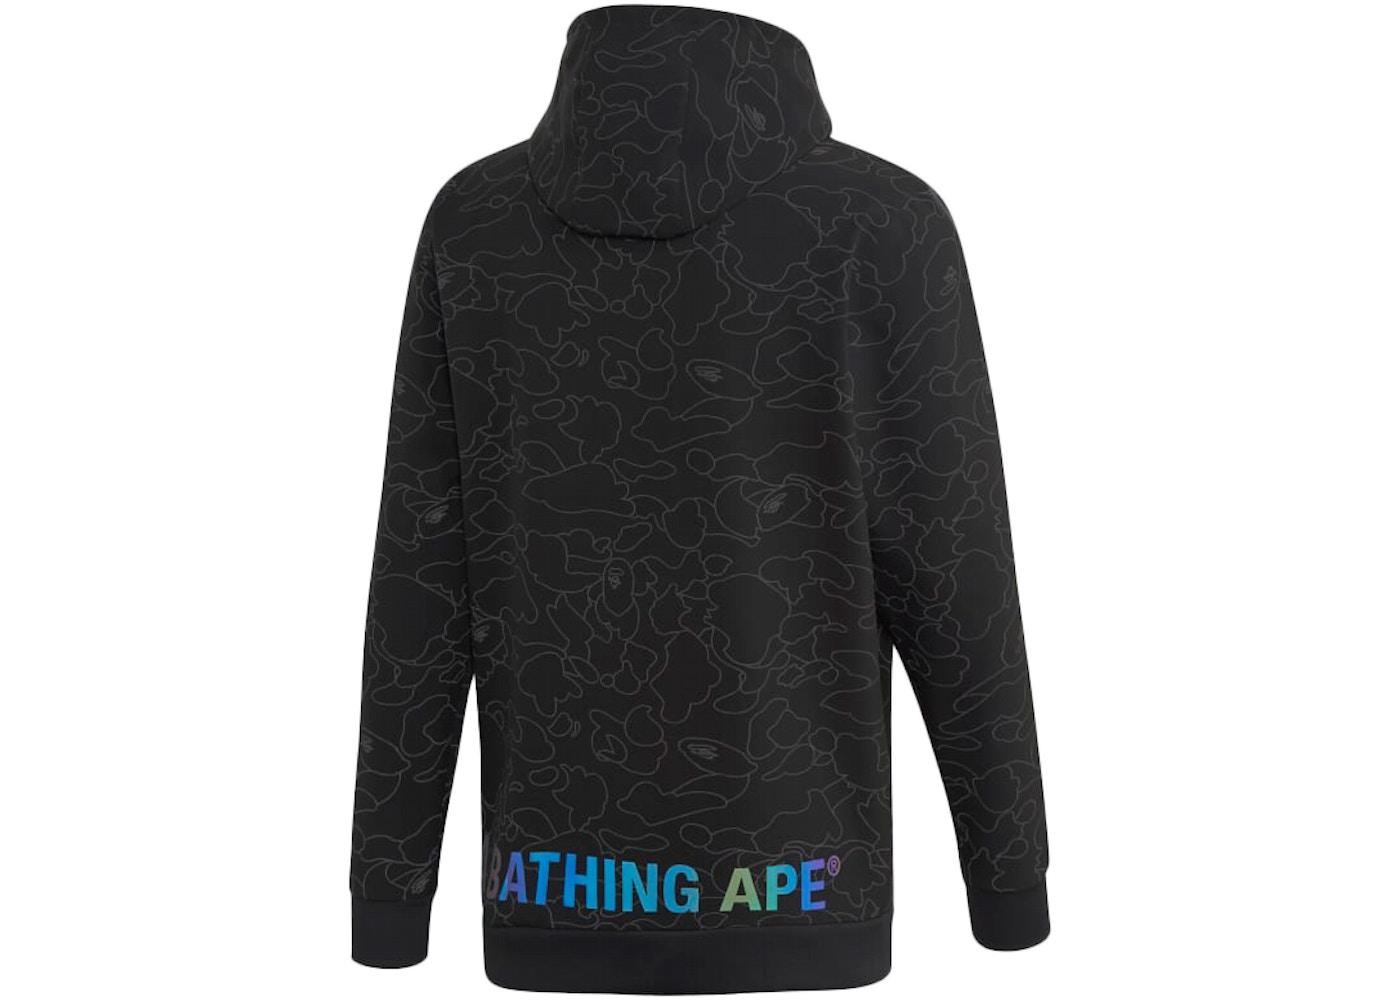 8ba7c65eb Sell. or Ask. Size S. View All Bids. BAPE x Adidas Tech Hoodie Black